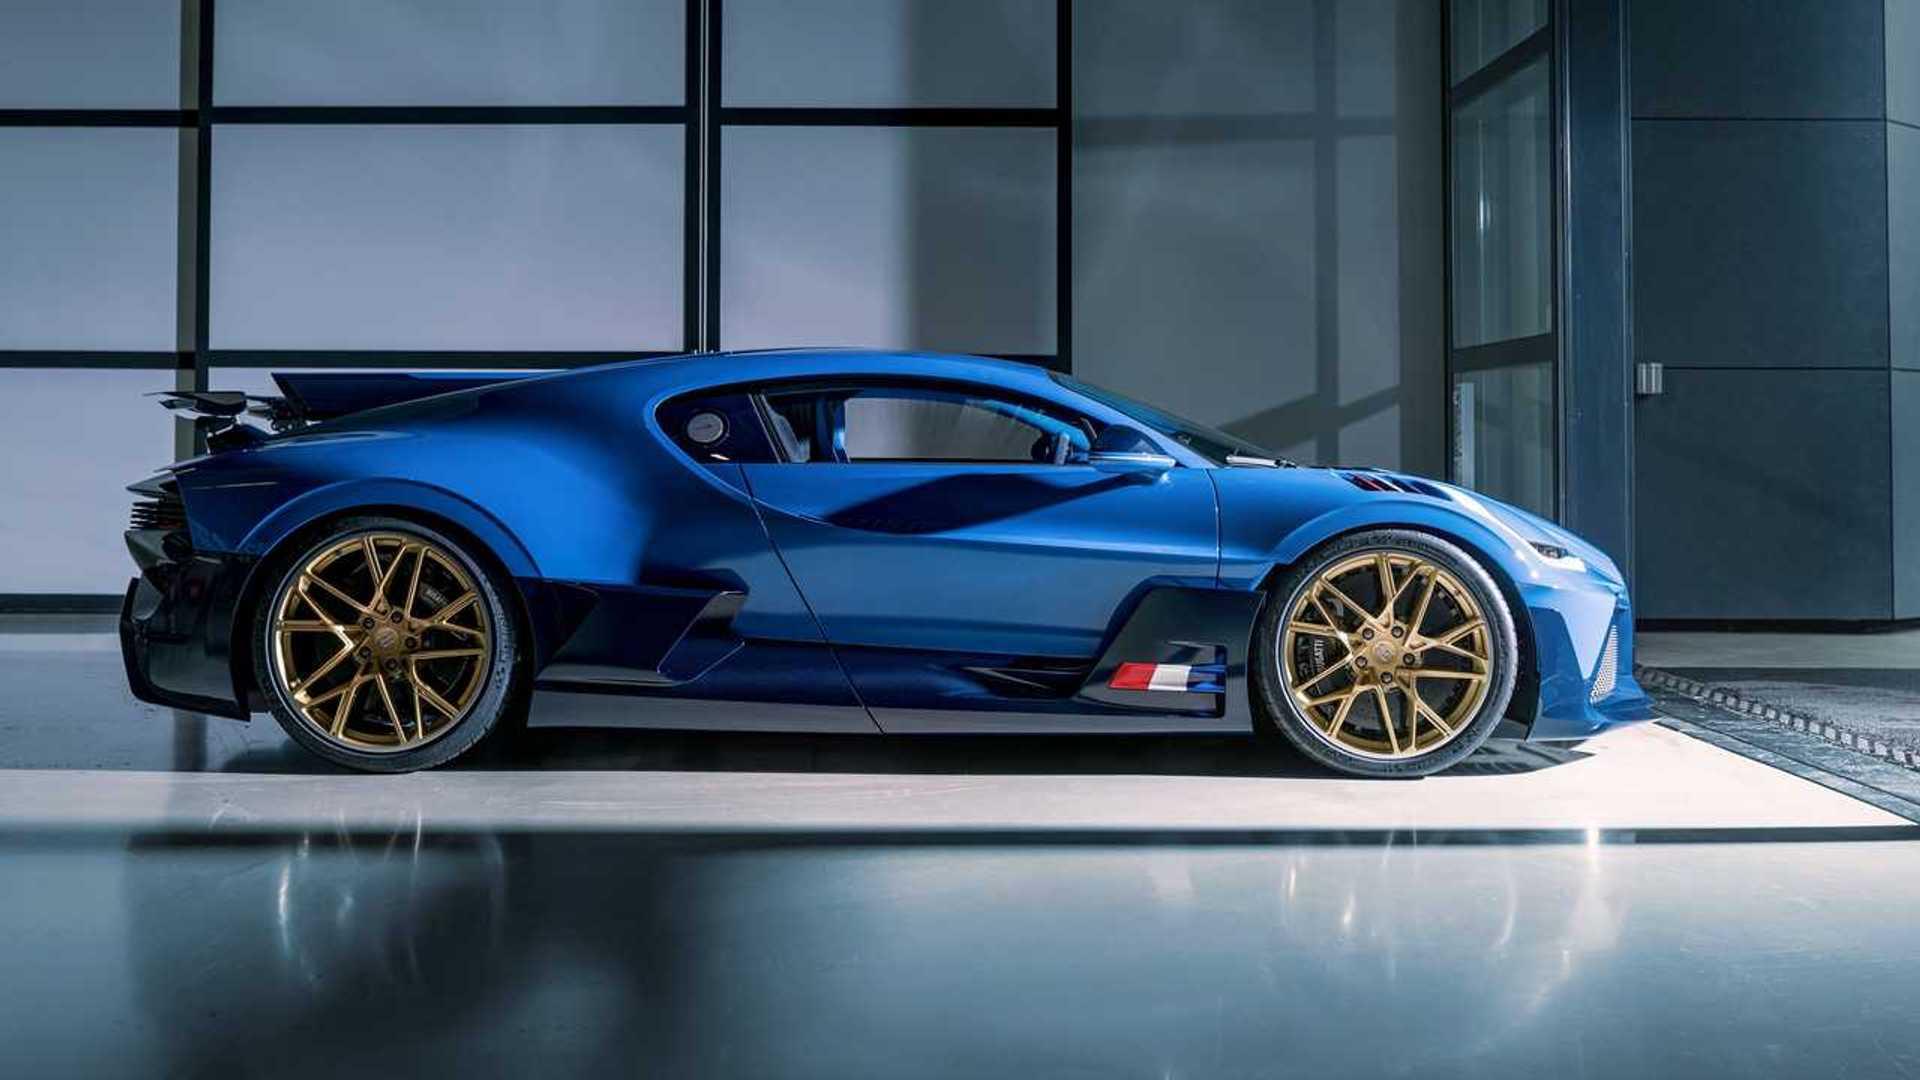 https://cdn.motor1.com/images/mgl/o0BGy/s6/bugatti-divo-side-view.jpg